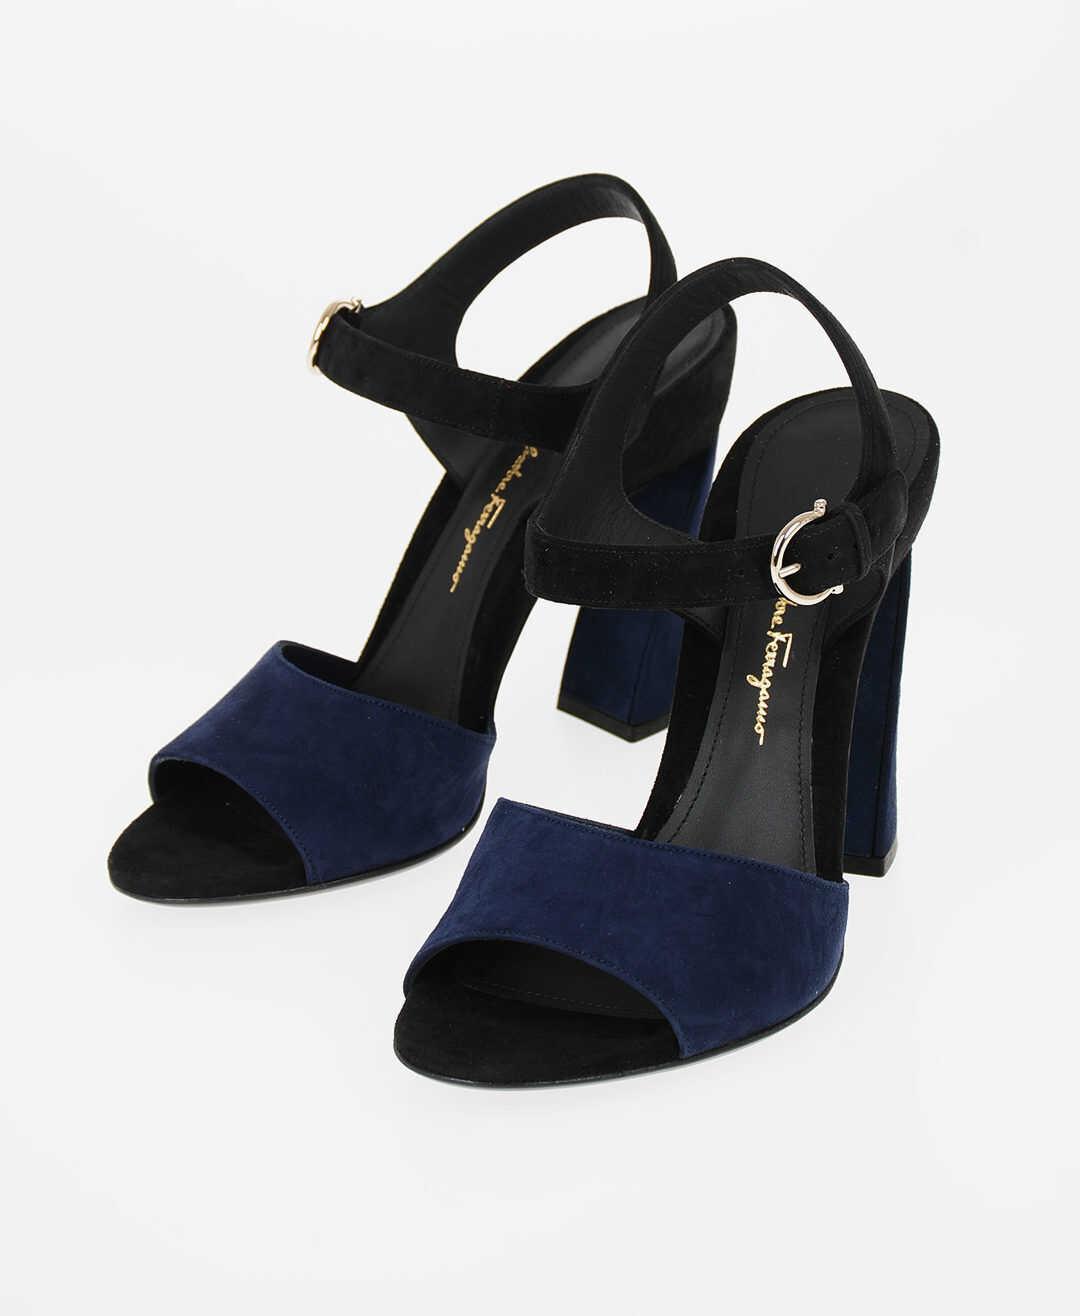 Salvatore Ferragamo 10.5cm Suede leather AEDE Ankle-strap sandals BLUE imagine b-mall.ro